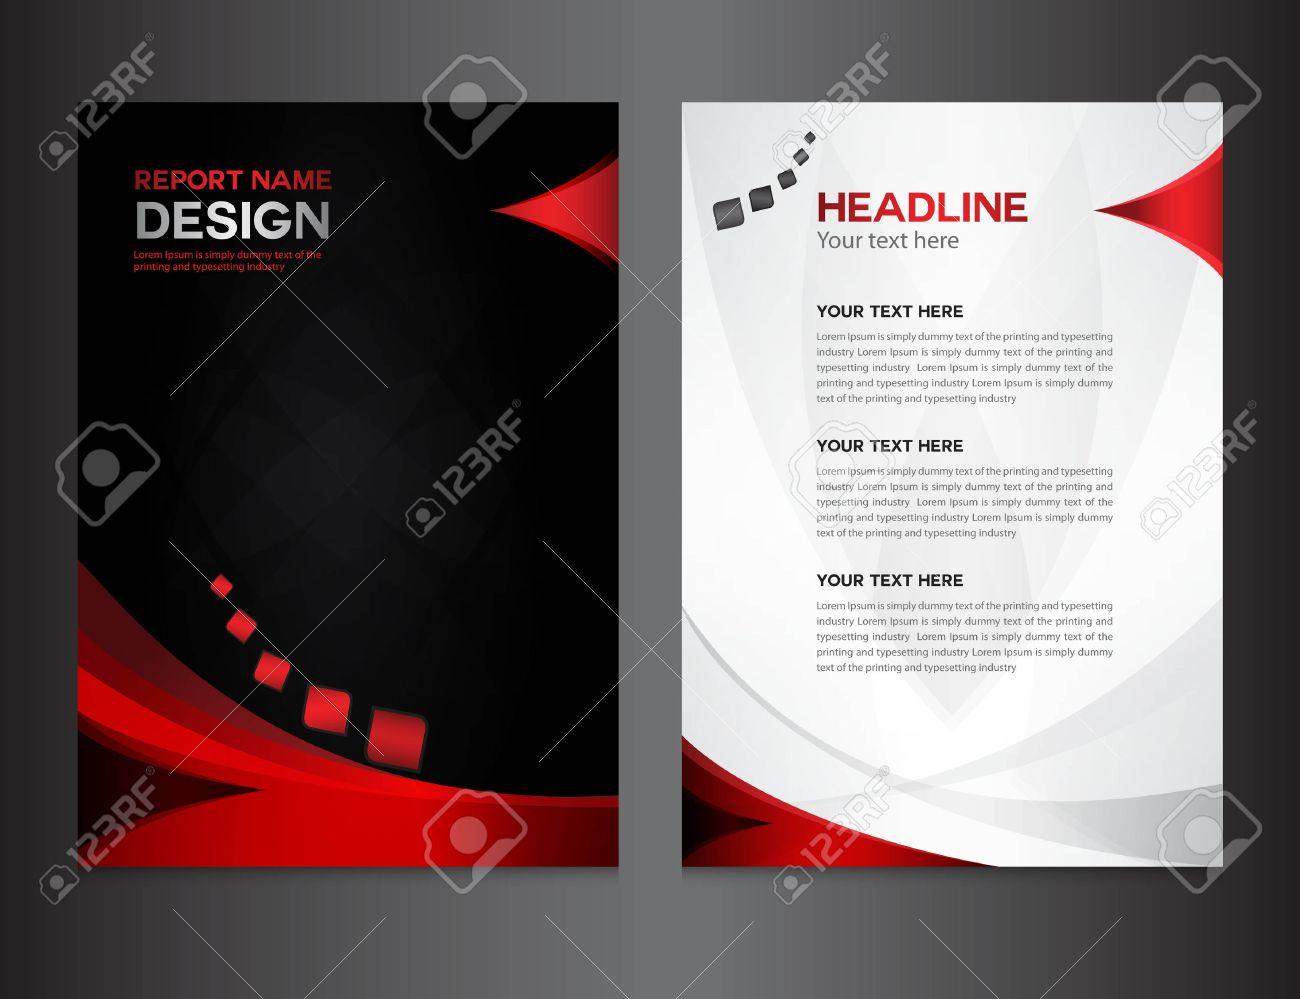 red Annual report Vector illustration,cover design, brochure design, template design,graphic design,vector illustration,report cover, Abstract background,polygon background, cover template - 50528296